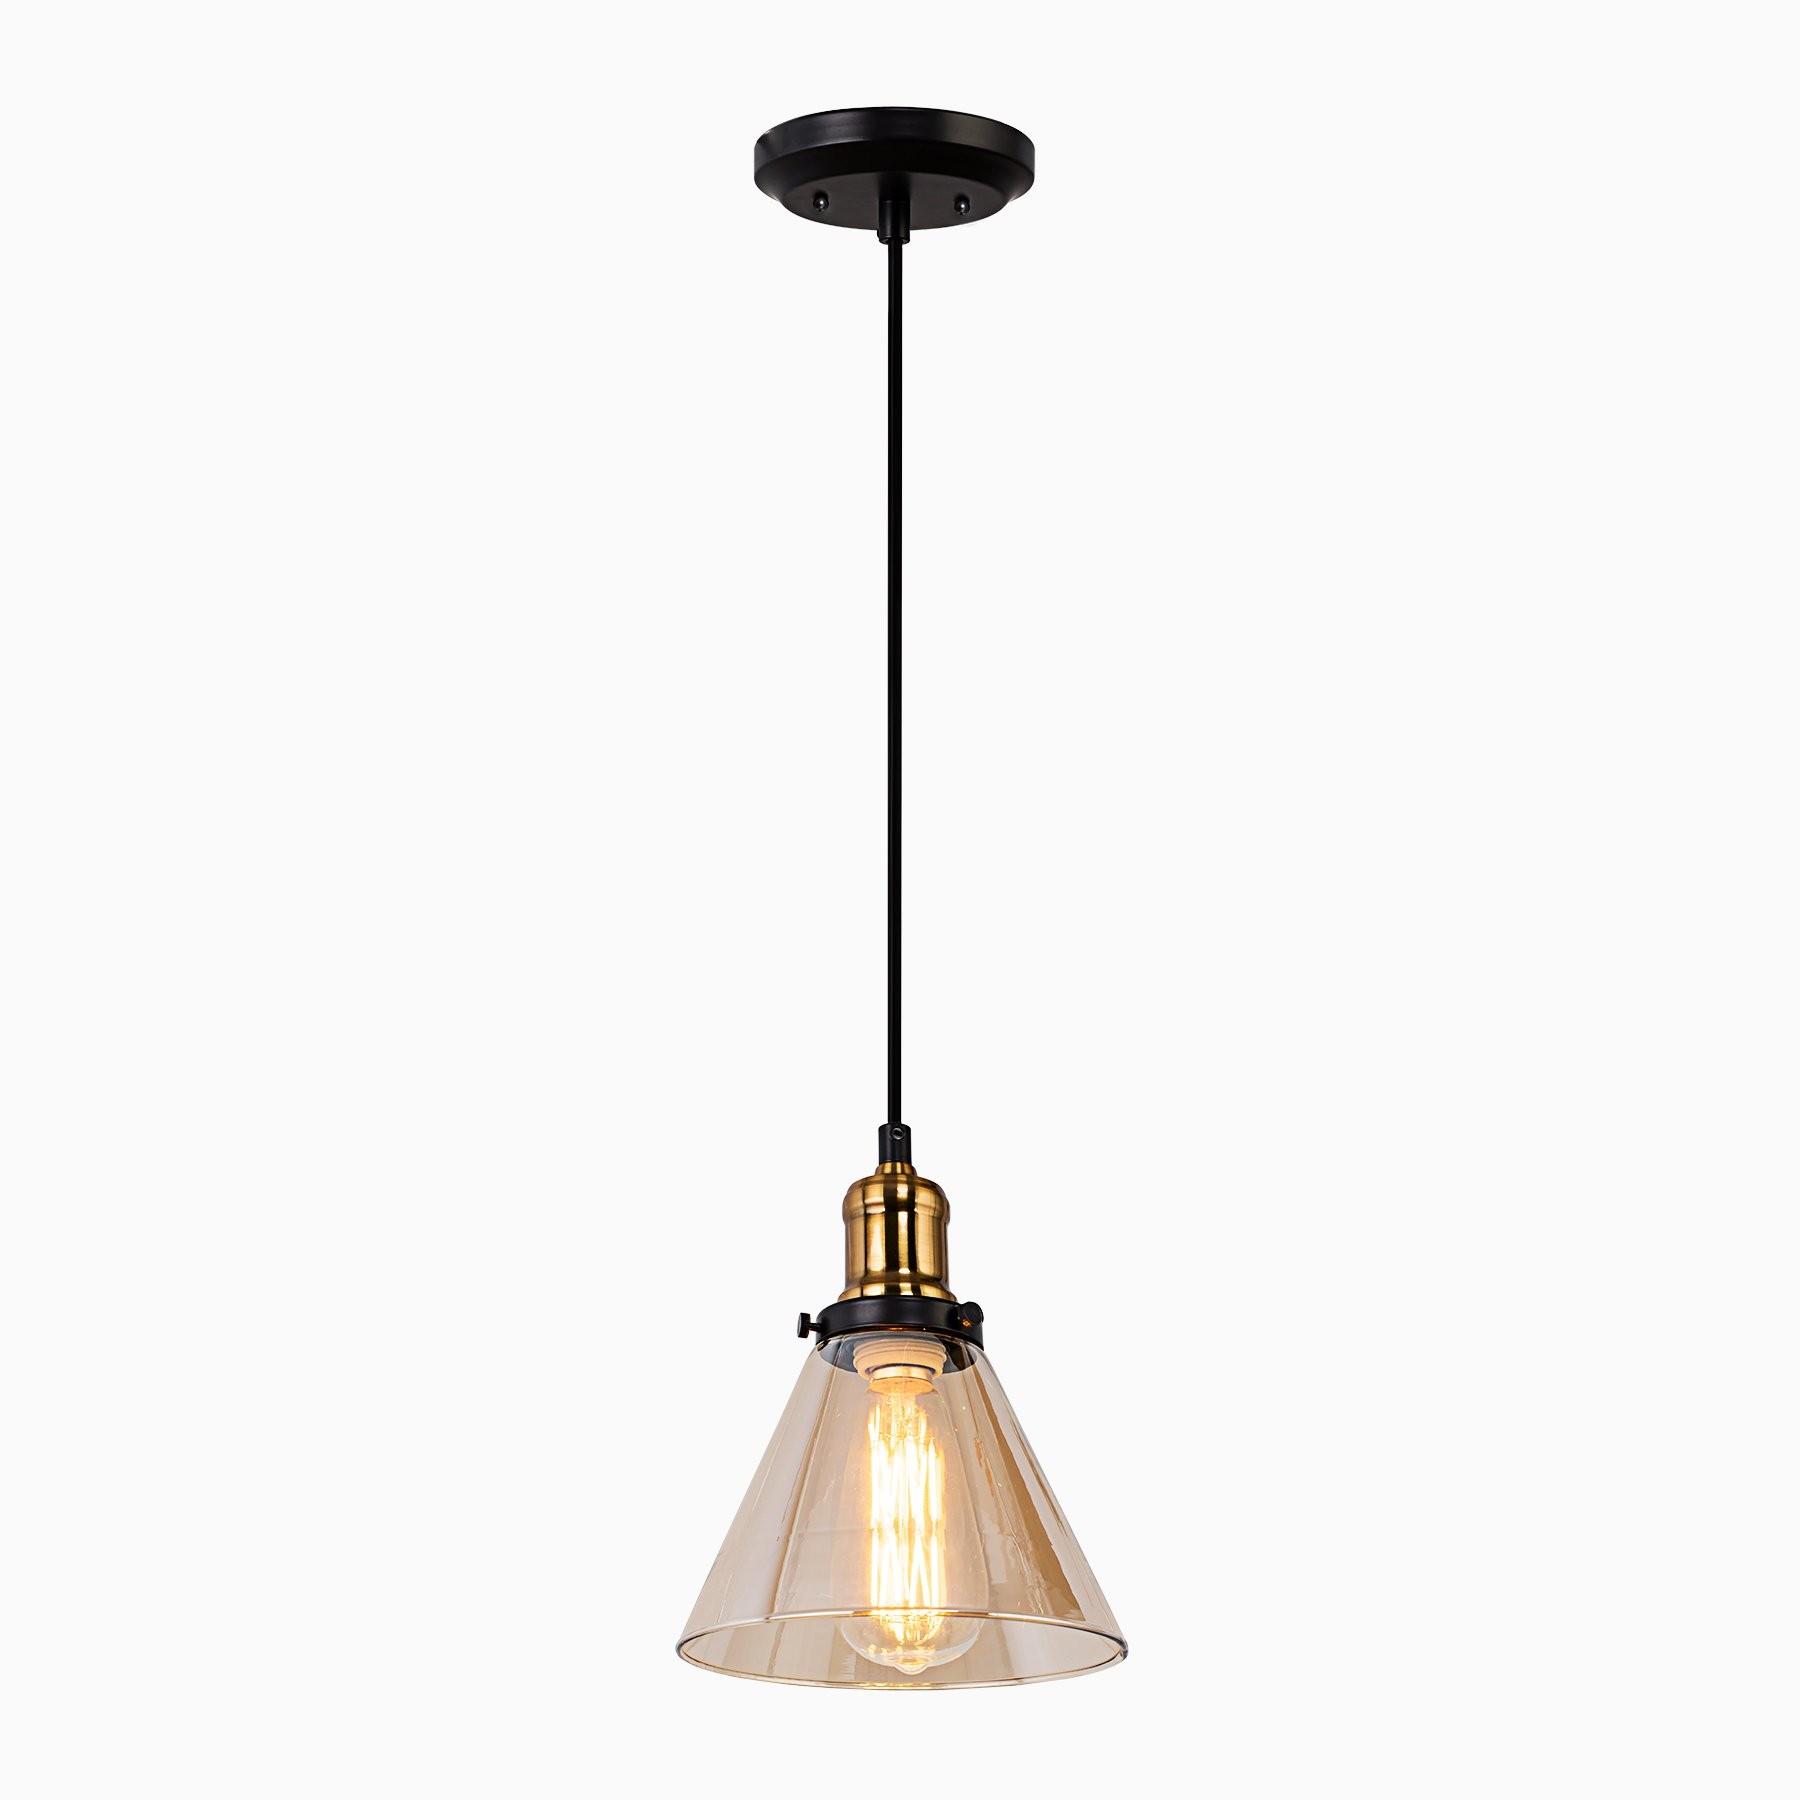 Bristow mini pendant light ceiling mounted pendant bristow mini pendant light arubaitofo Choice Image